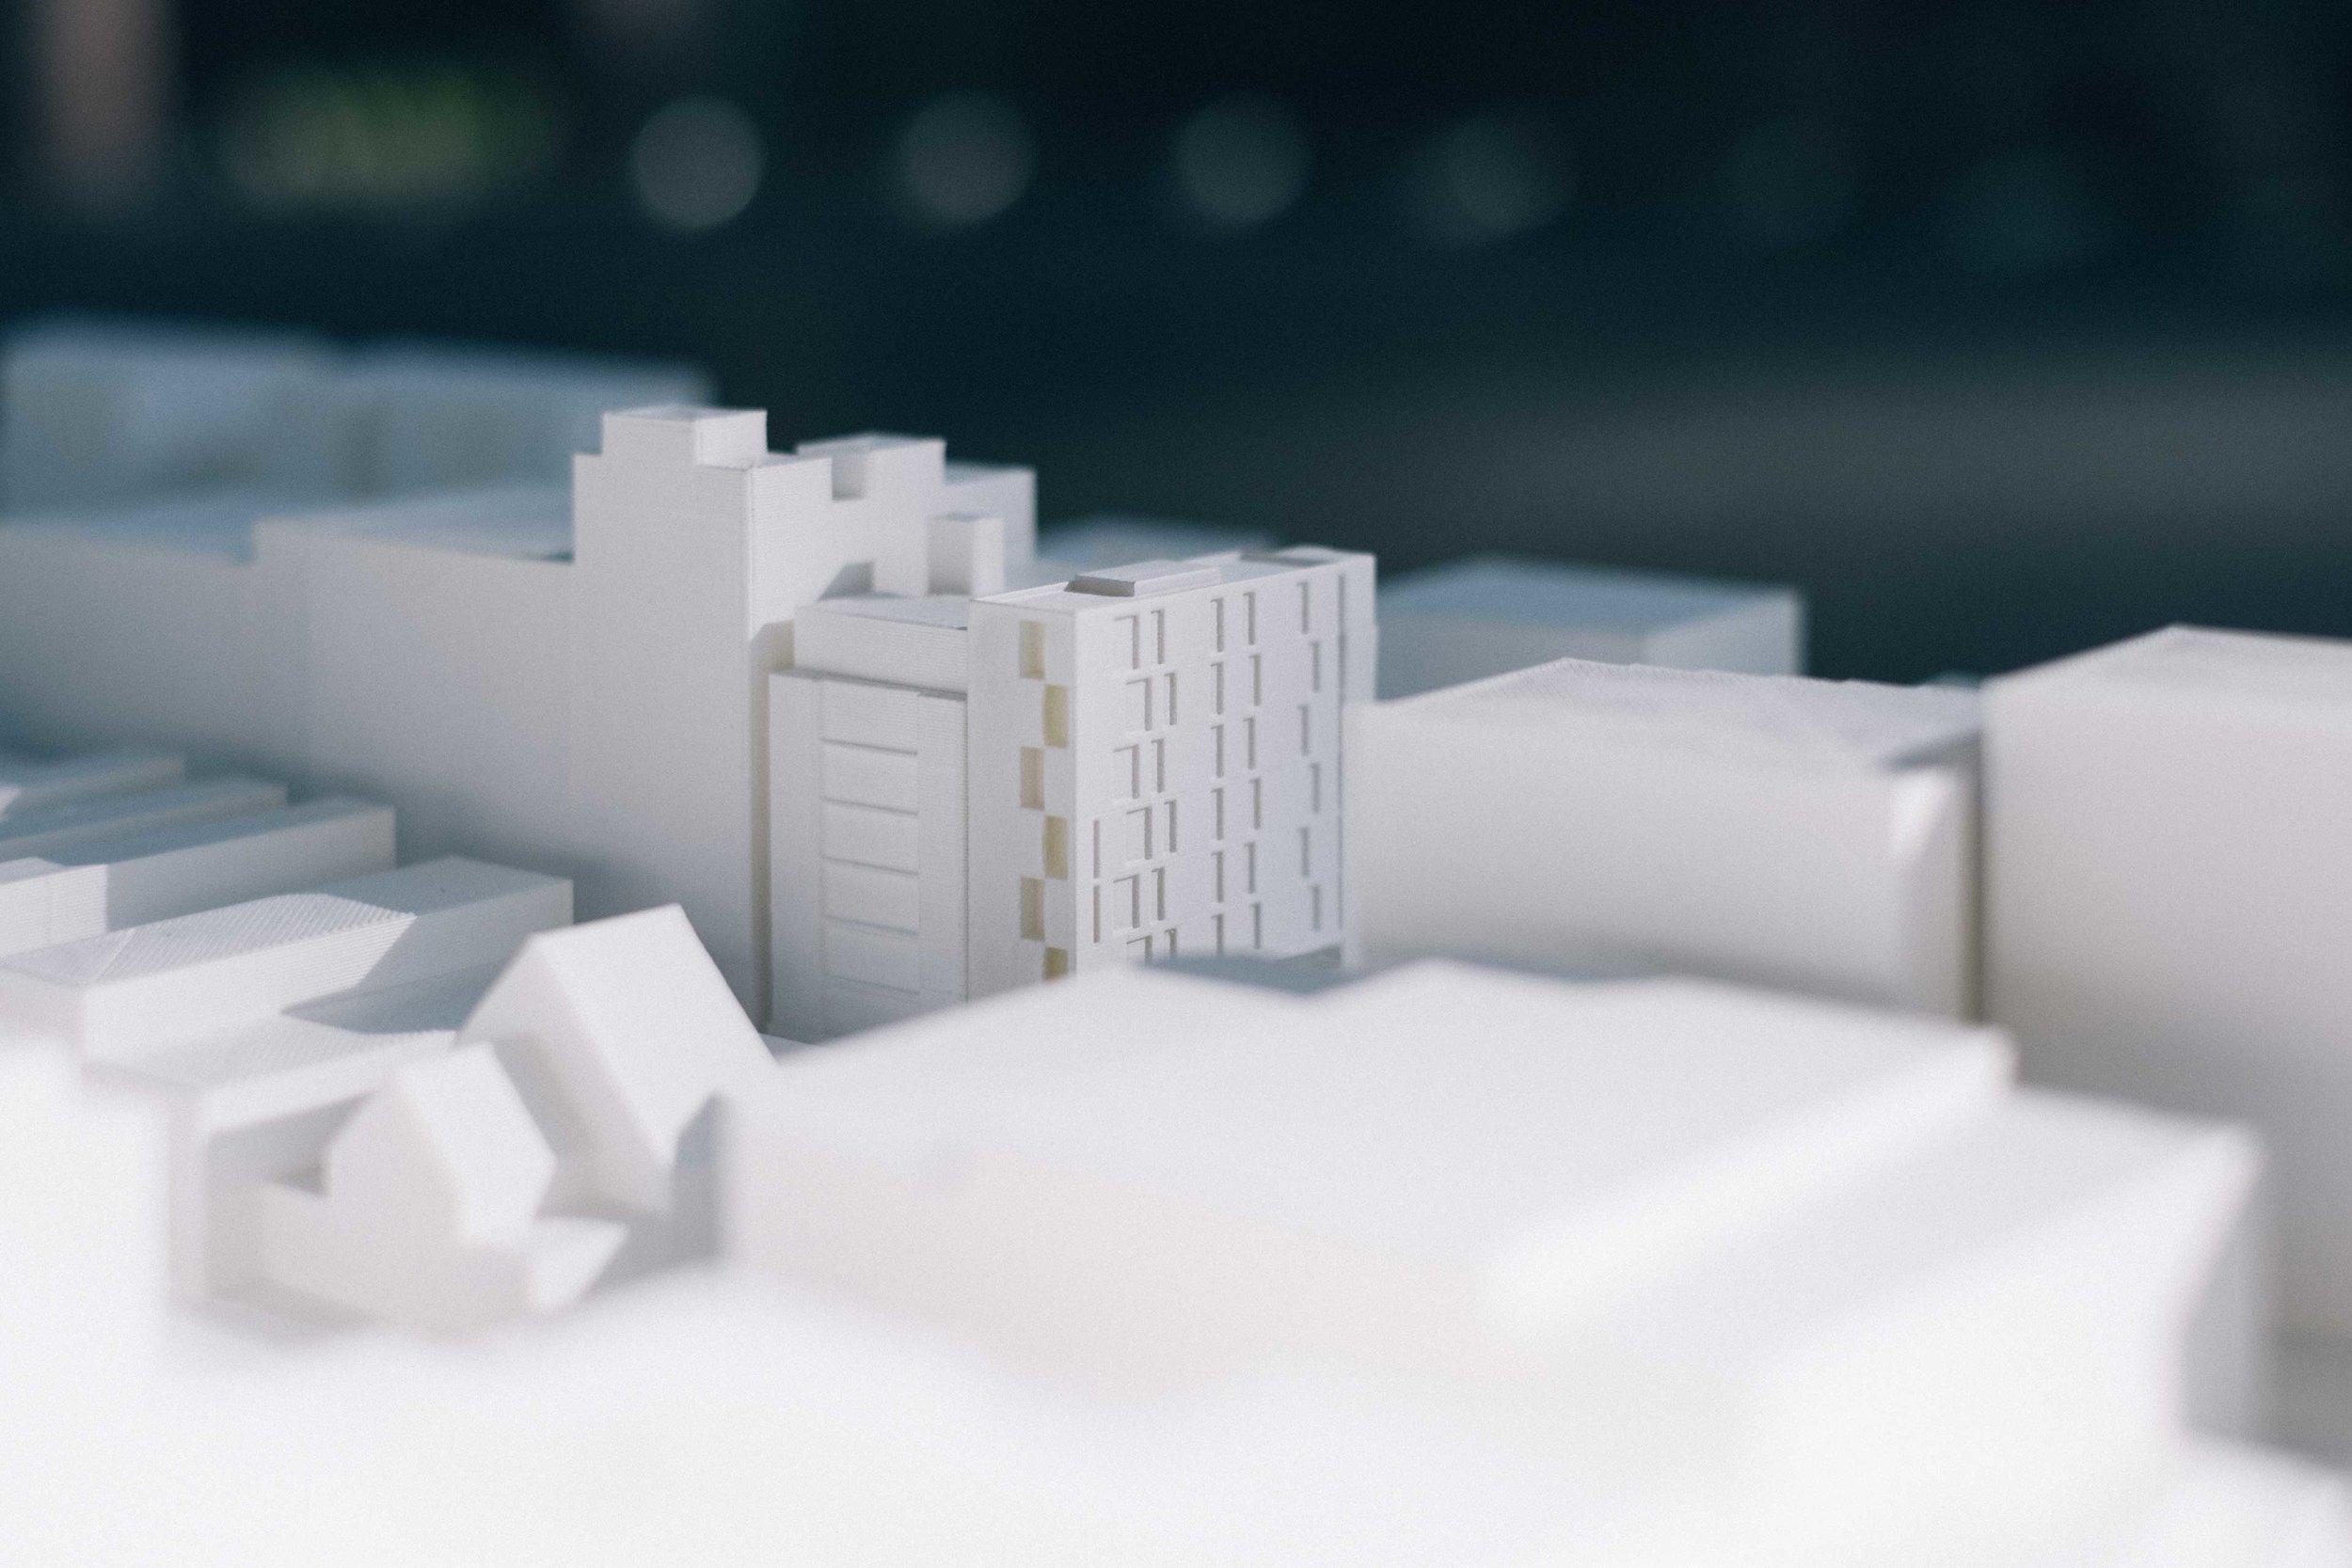 make_models_3D_printing_fabrication.jpg